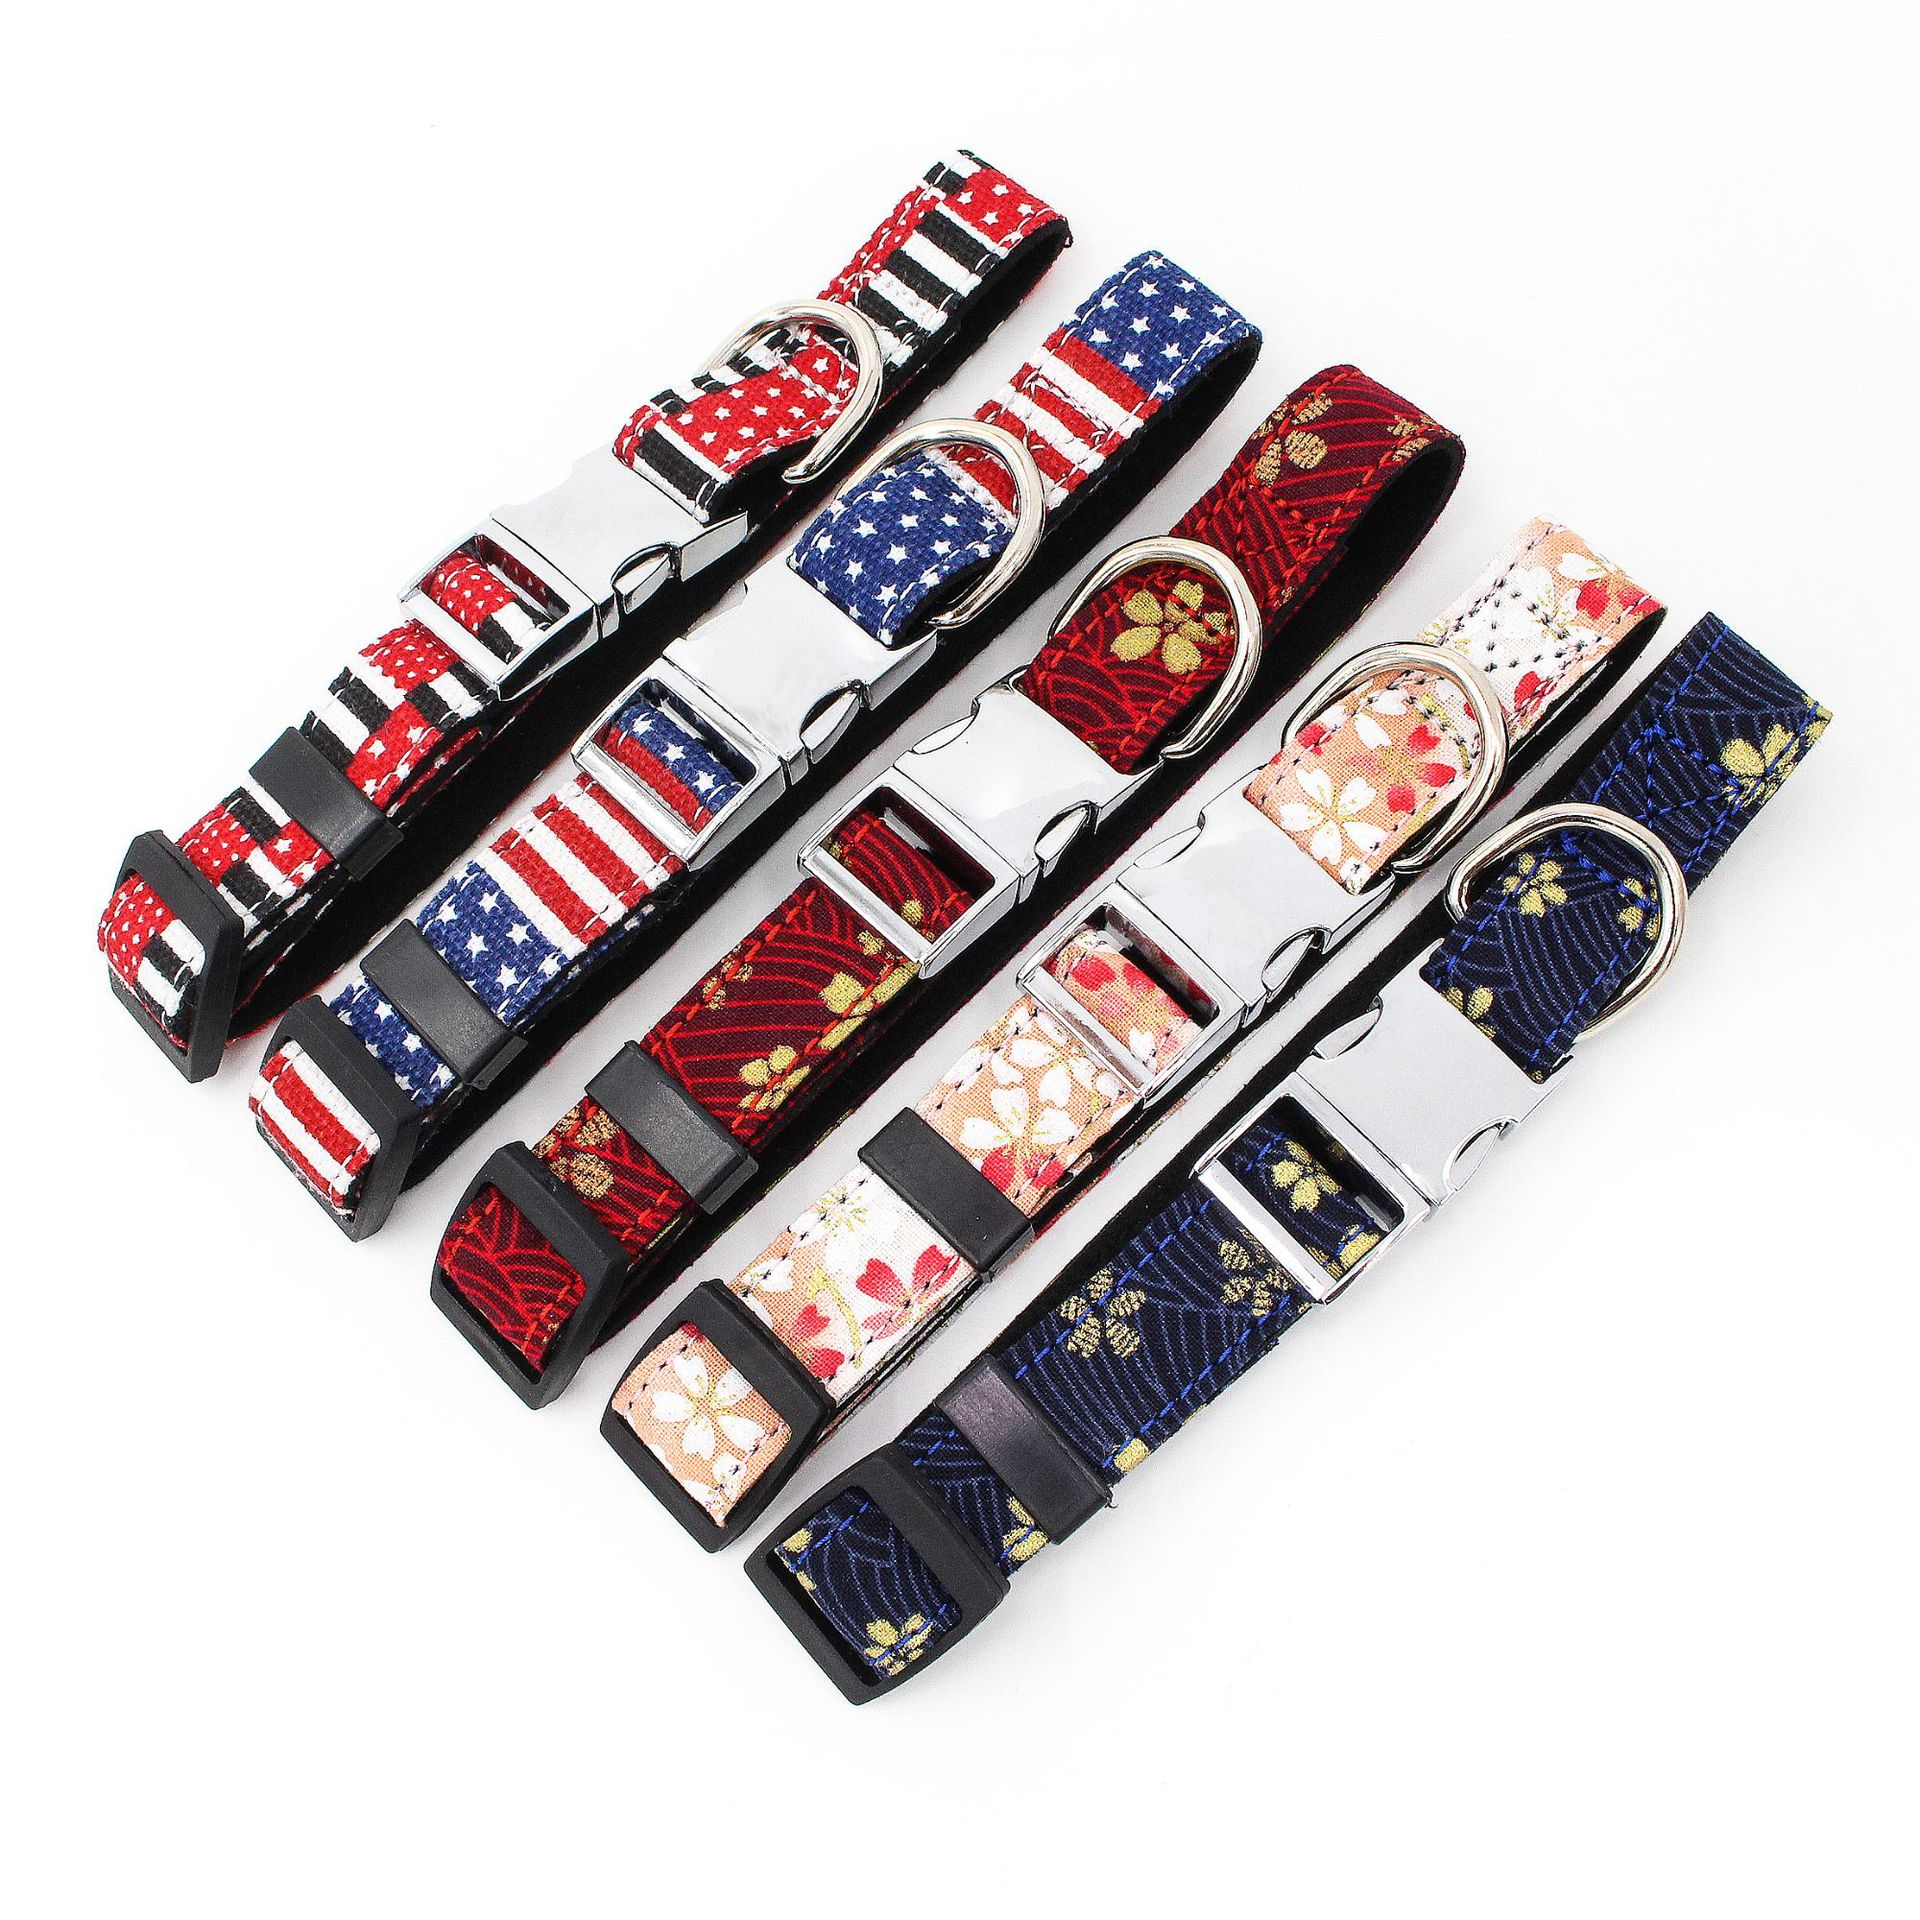 Jin Ling Jie New Style Fabric Pet Collar Metal Buckle Neck Ring Microfiber Underlay Bag Comfortable Pet Collar Dog Supplies